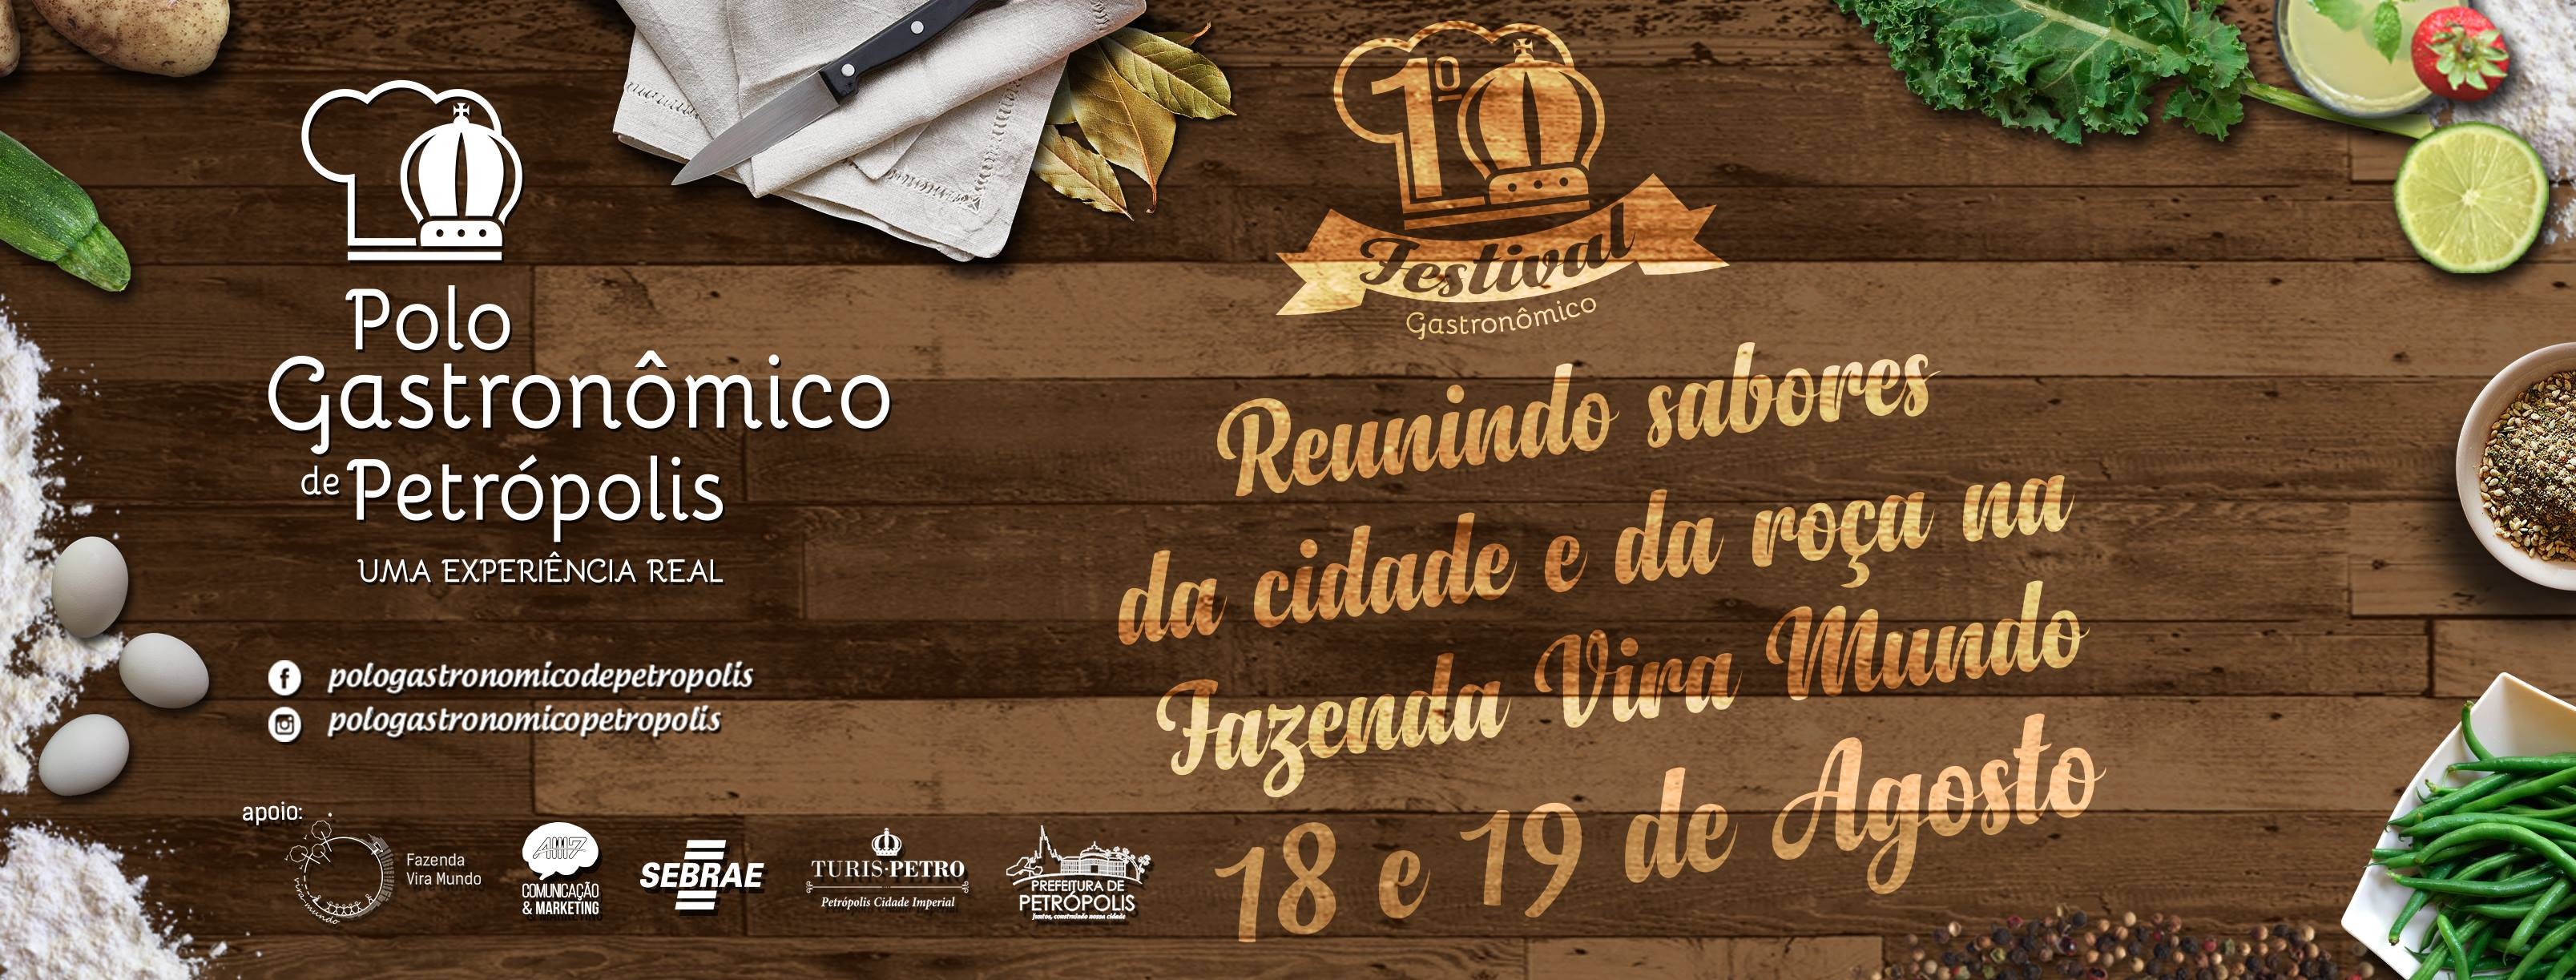 1º Festival Gastronômico - Polo Gastronômico de Petrópolis